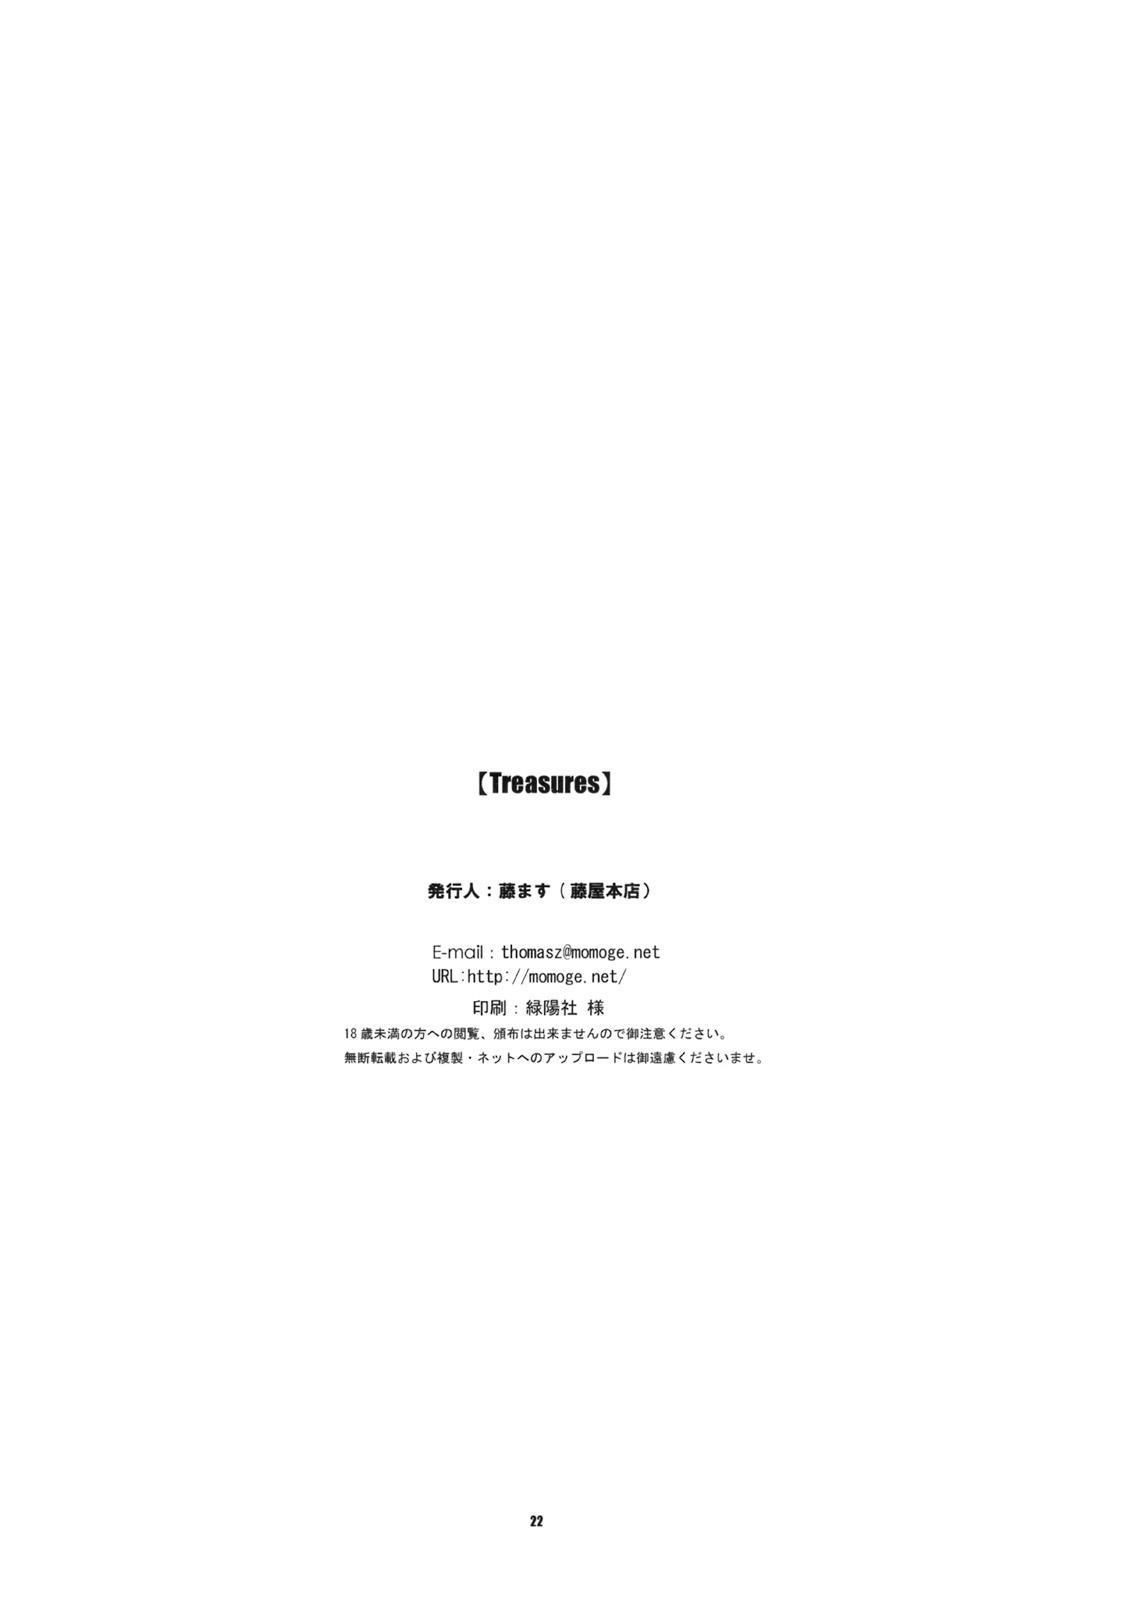 Treasures 20